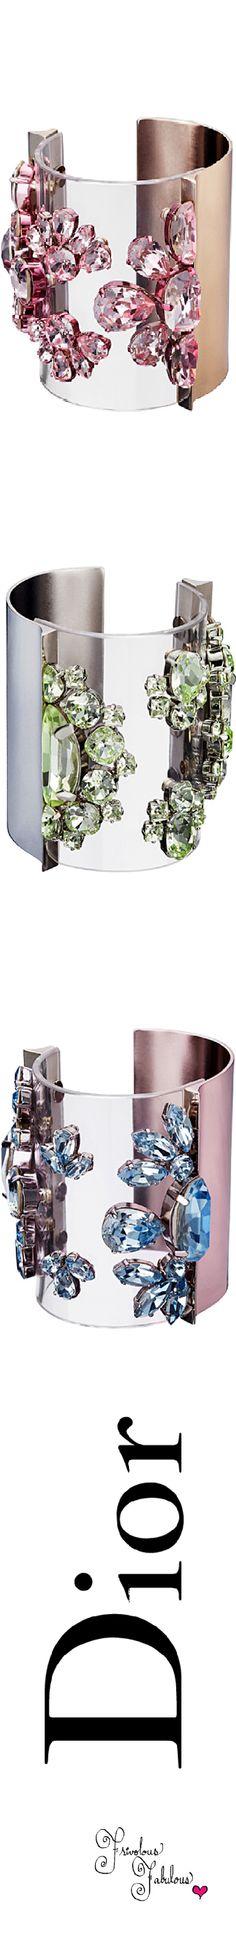 Frivolous Fabulous - Dior Jewelry Box, Jewelery, Vintage Jewelry, Jewelry Accessories, Fashion Accessories, Fashion Jewelry, Jewelry Design, Christian Dior, Ring Bracelet